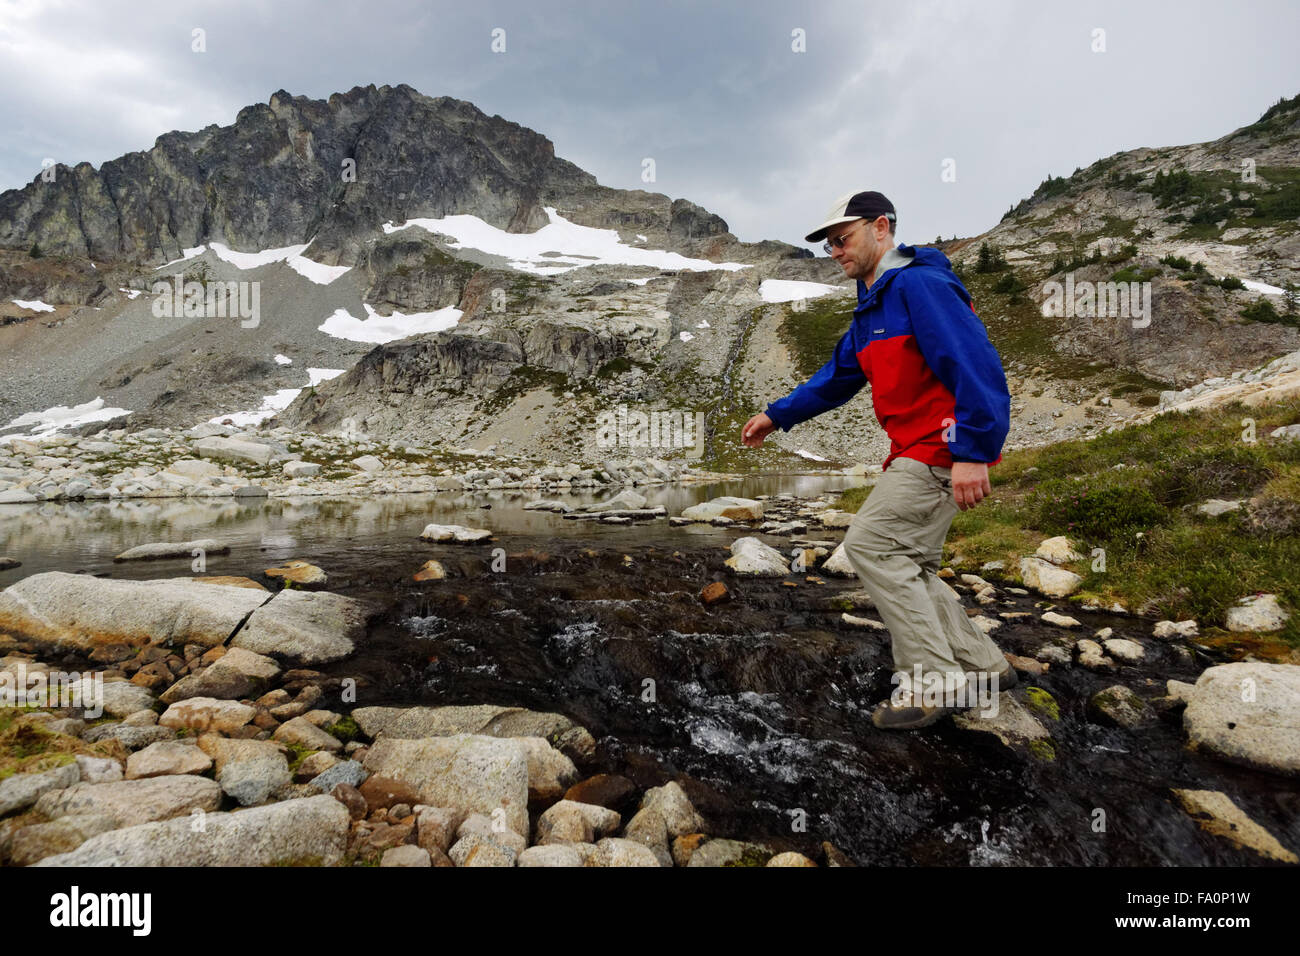 Man leaping stream, Silent Lakes, North Cascades National Park, Skagit County, Washington, USA - Stock Image